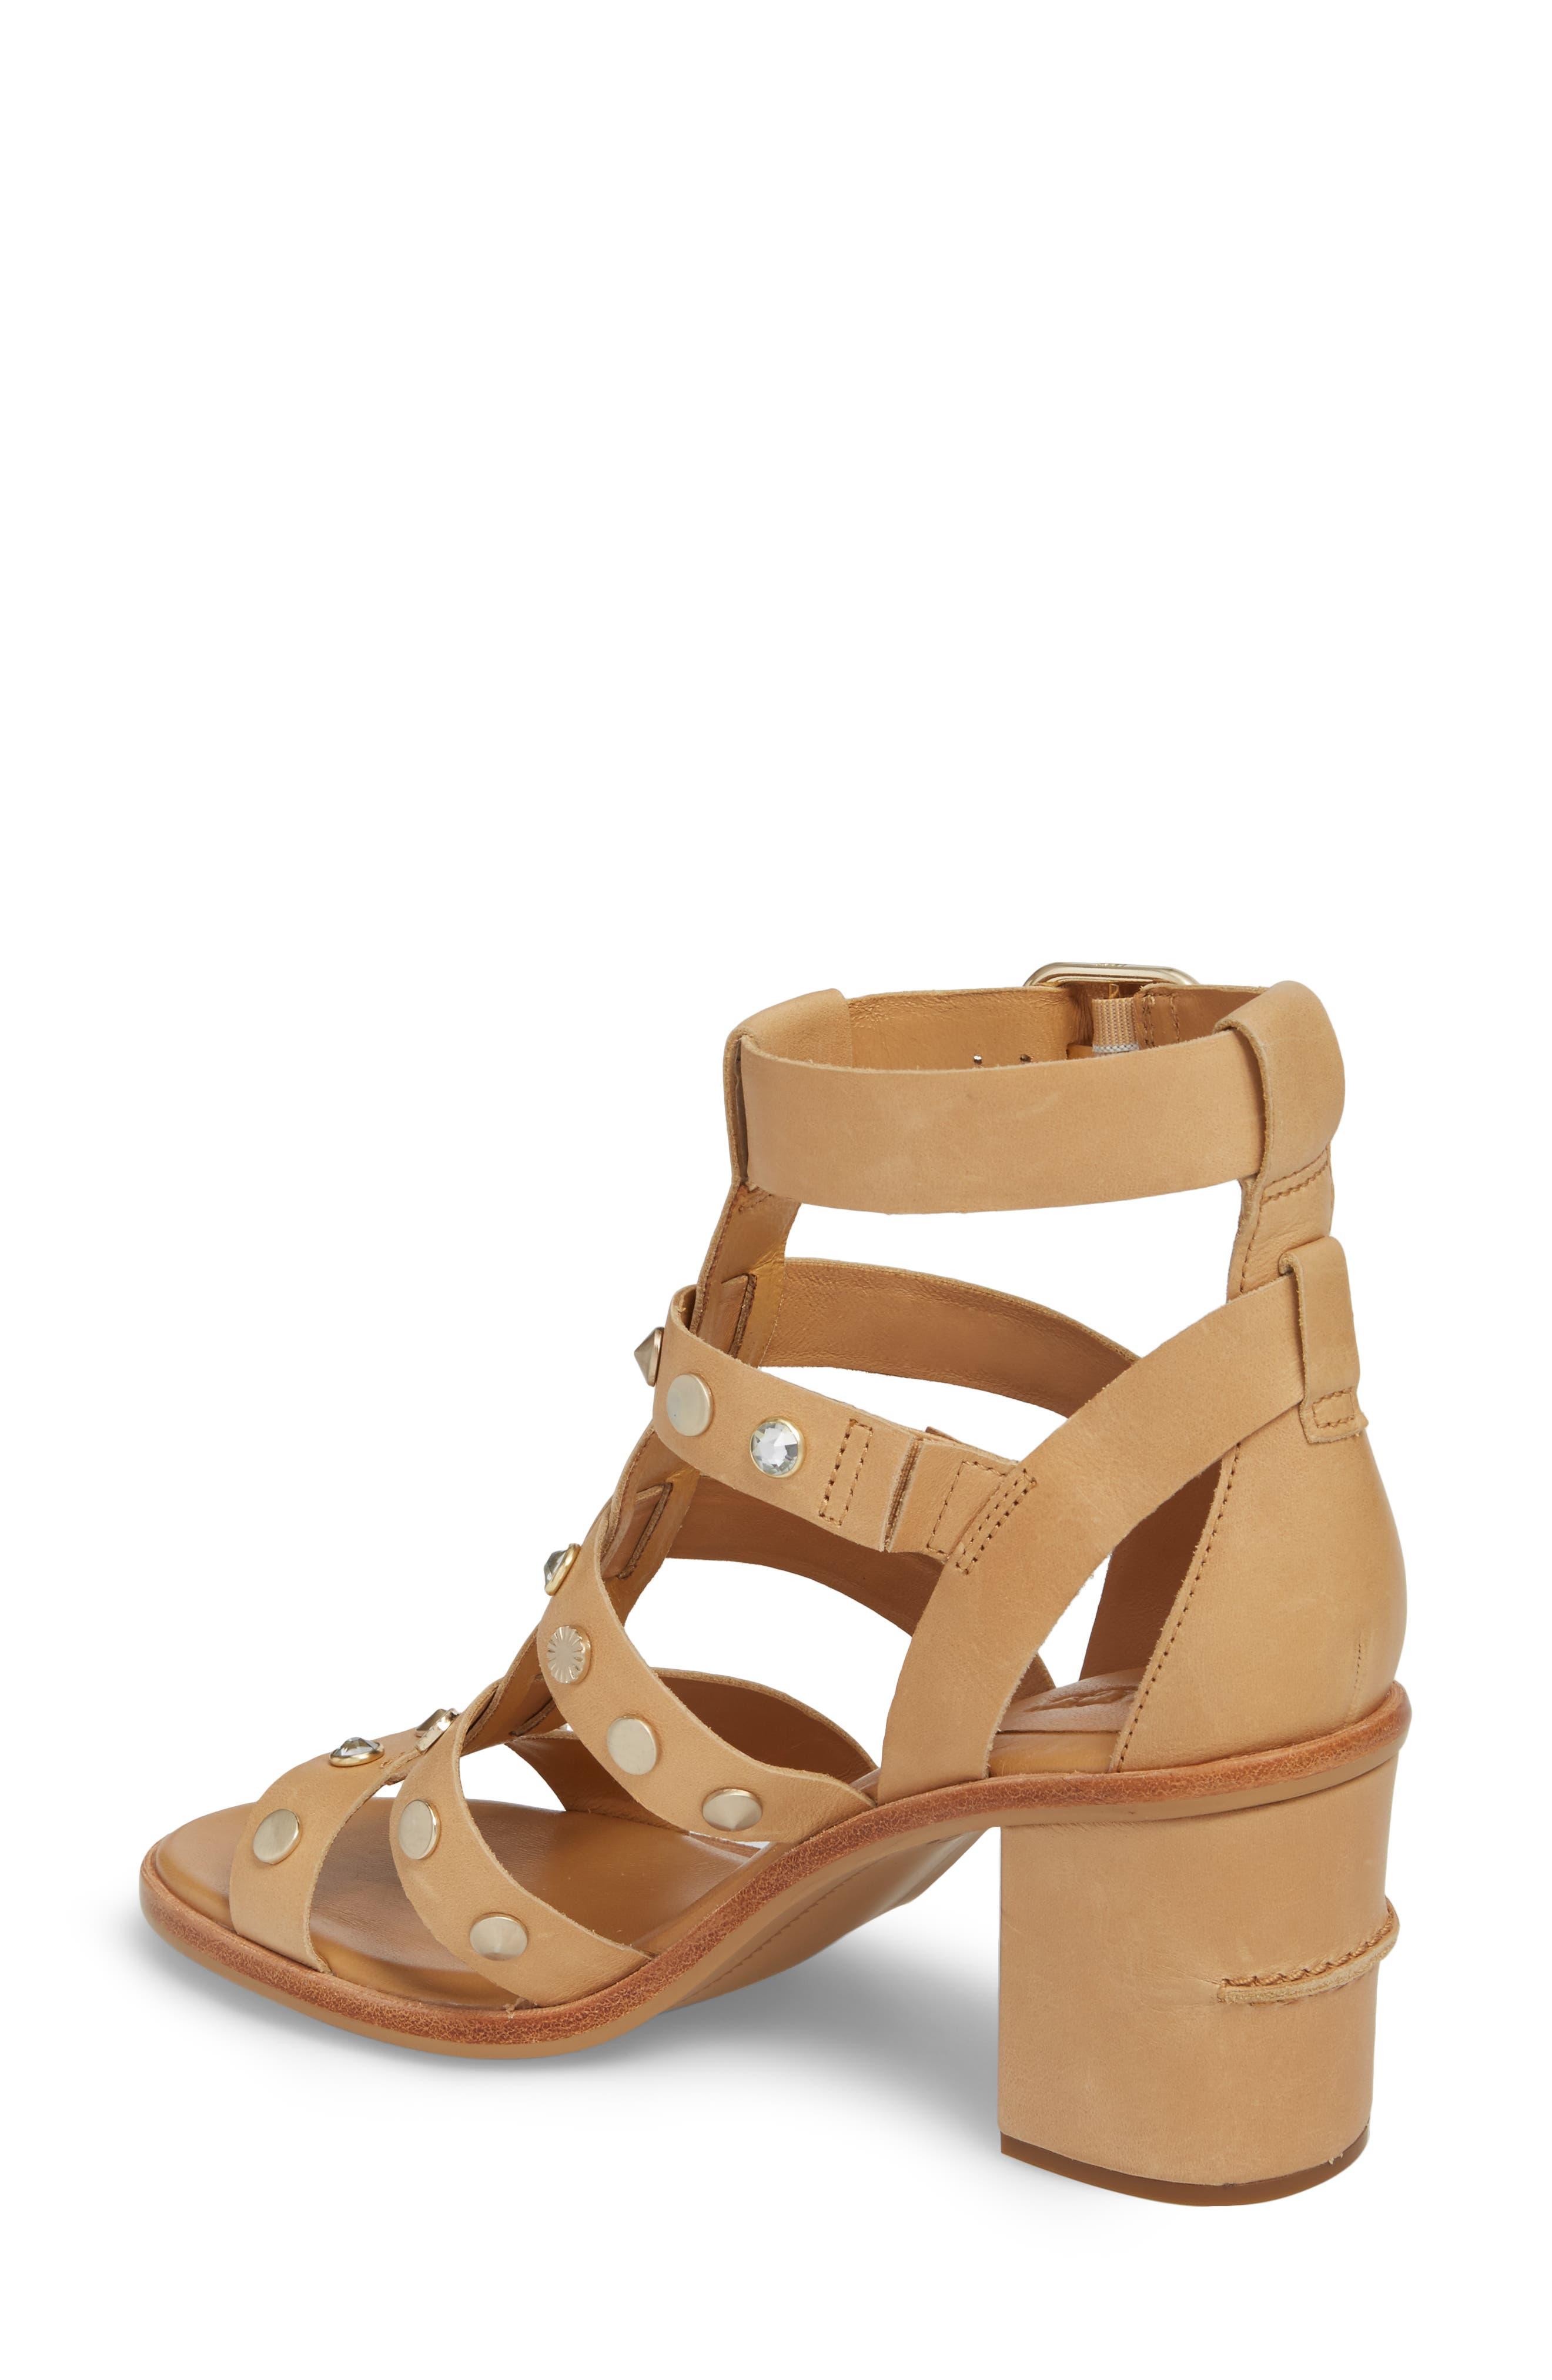 Macayla Studded Sandal,                             Alternate thumbnail 4, color,